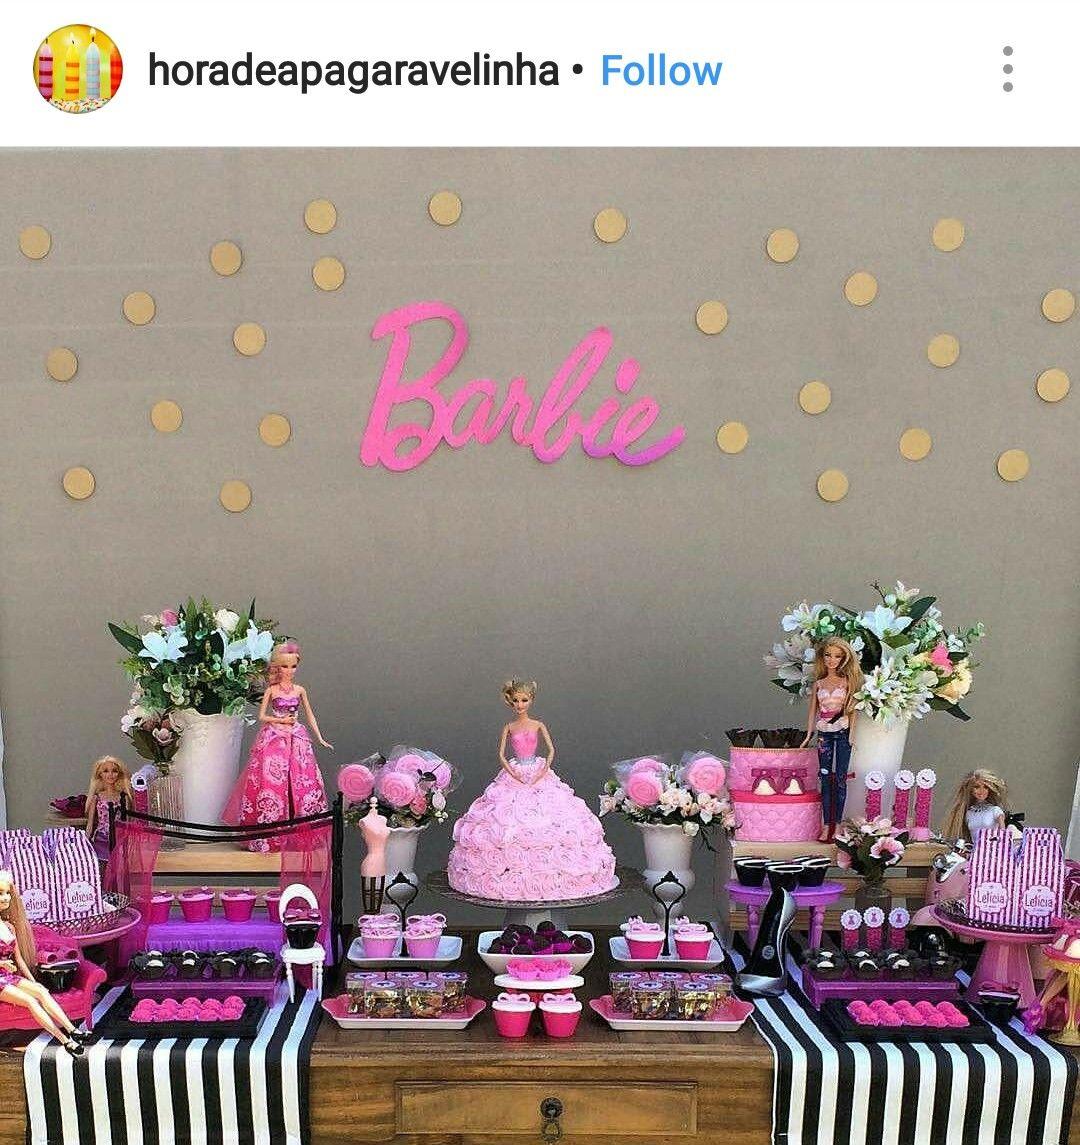 Barbie Zebra Theme 1st And 5th Birthday: Barbie Birthday Party Dessert Table And Decor